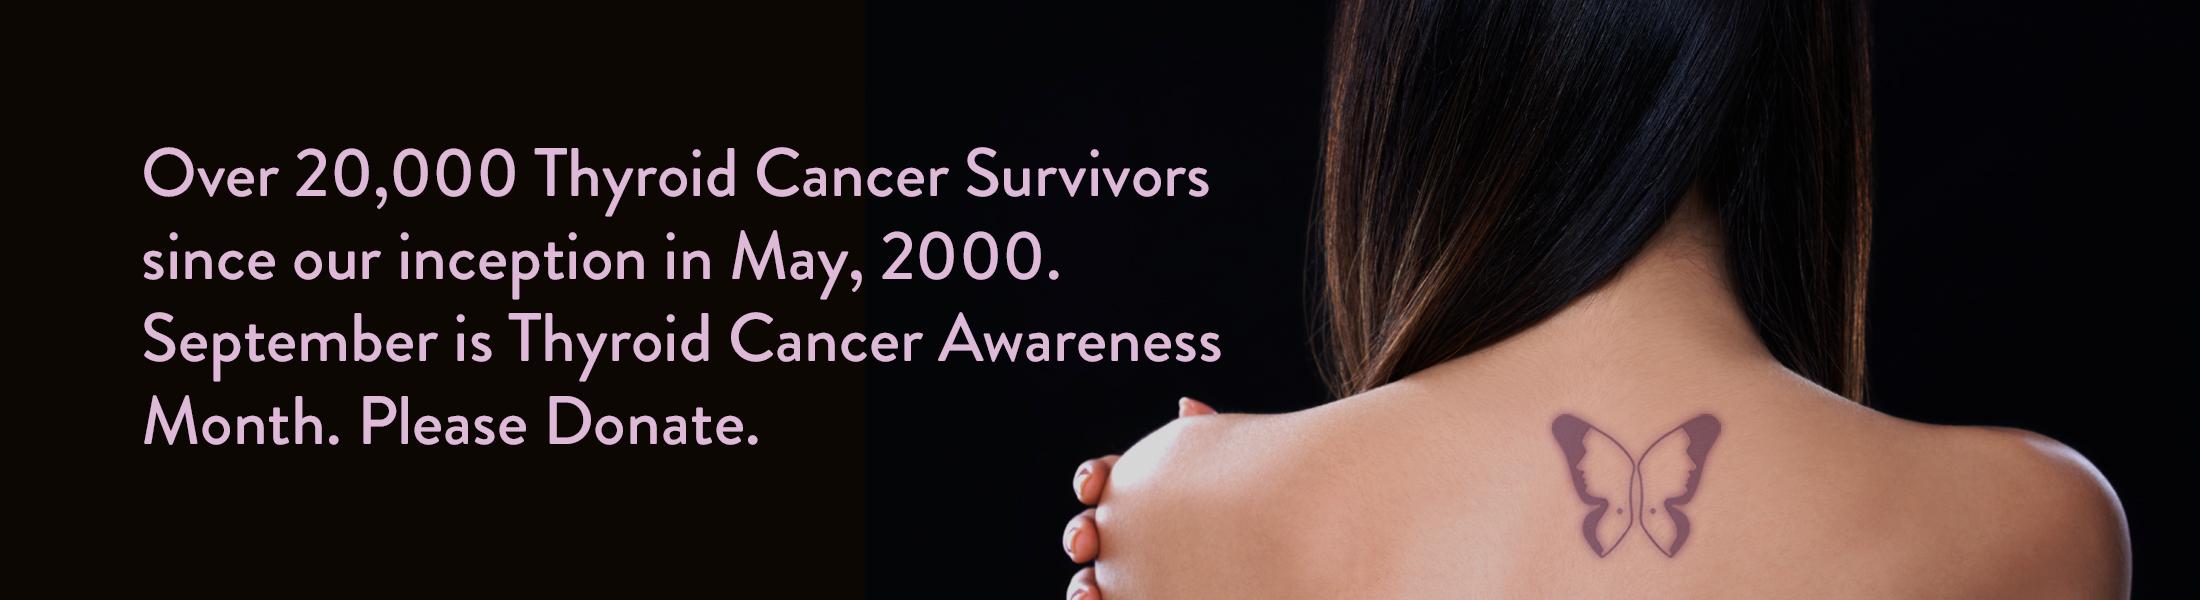 TCC_september_thyroid_cancer_awareness_month